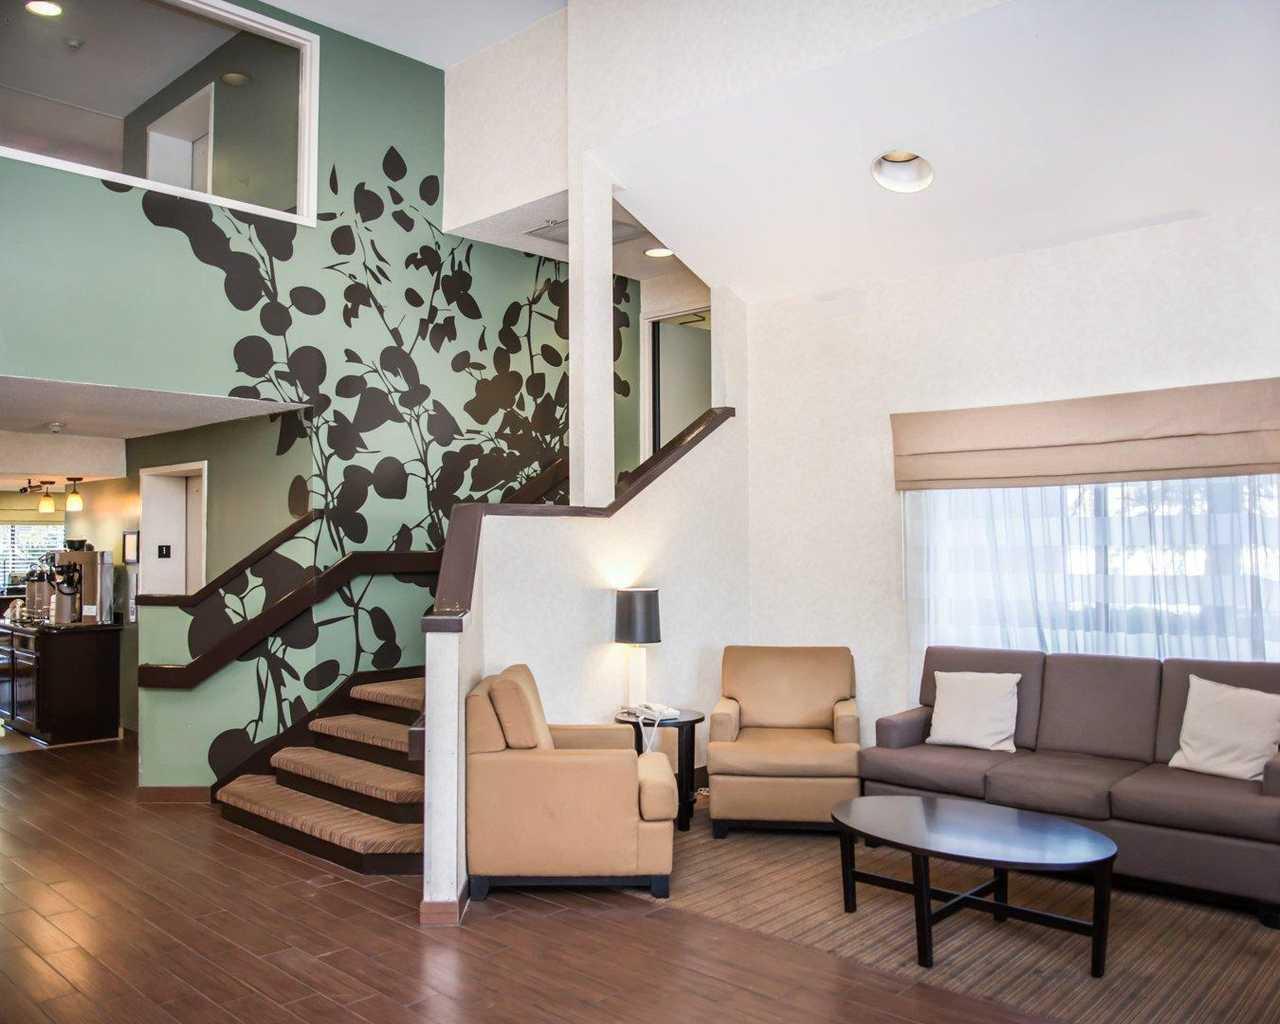 Sleep Inn University Place Charlotte - Lobby-2